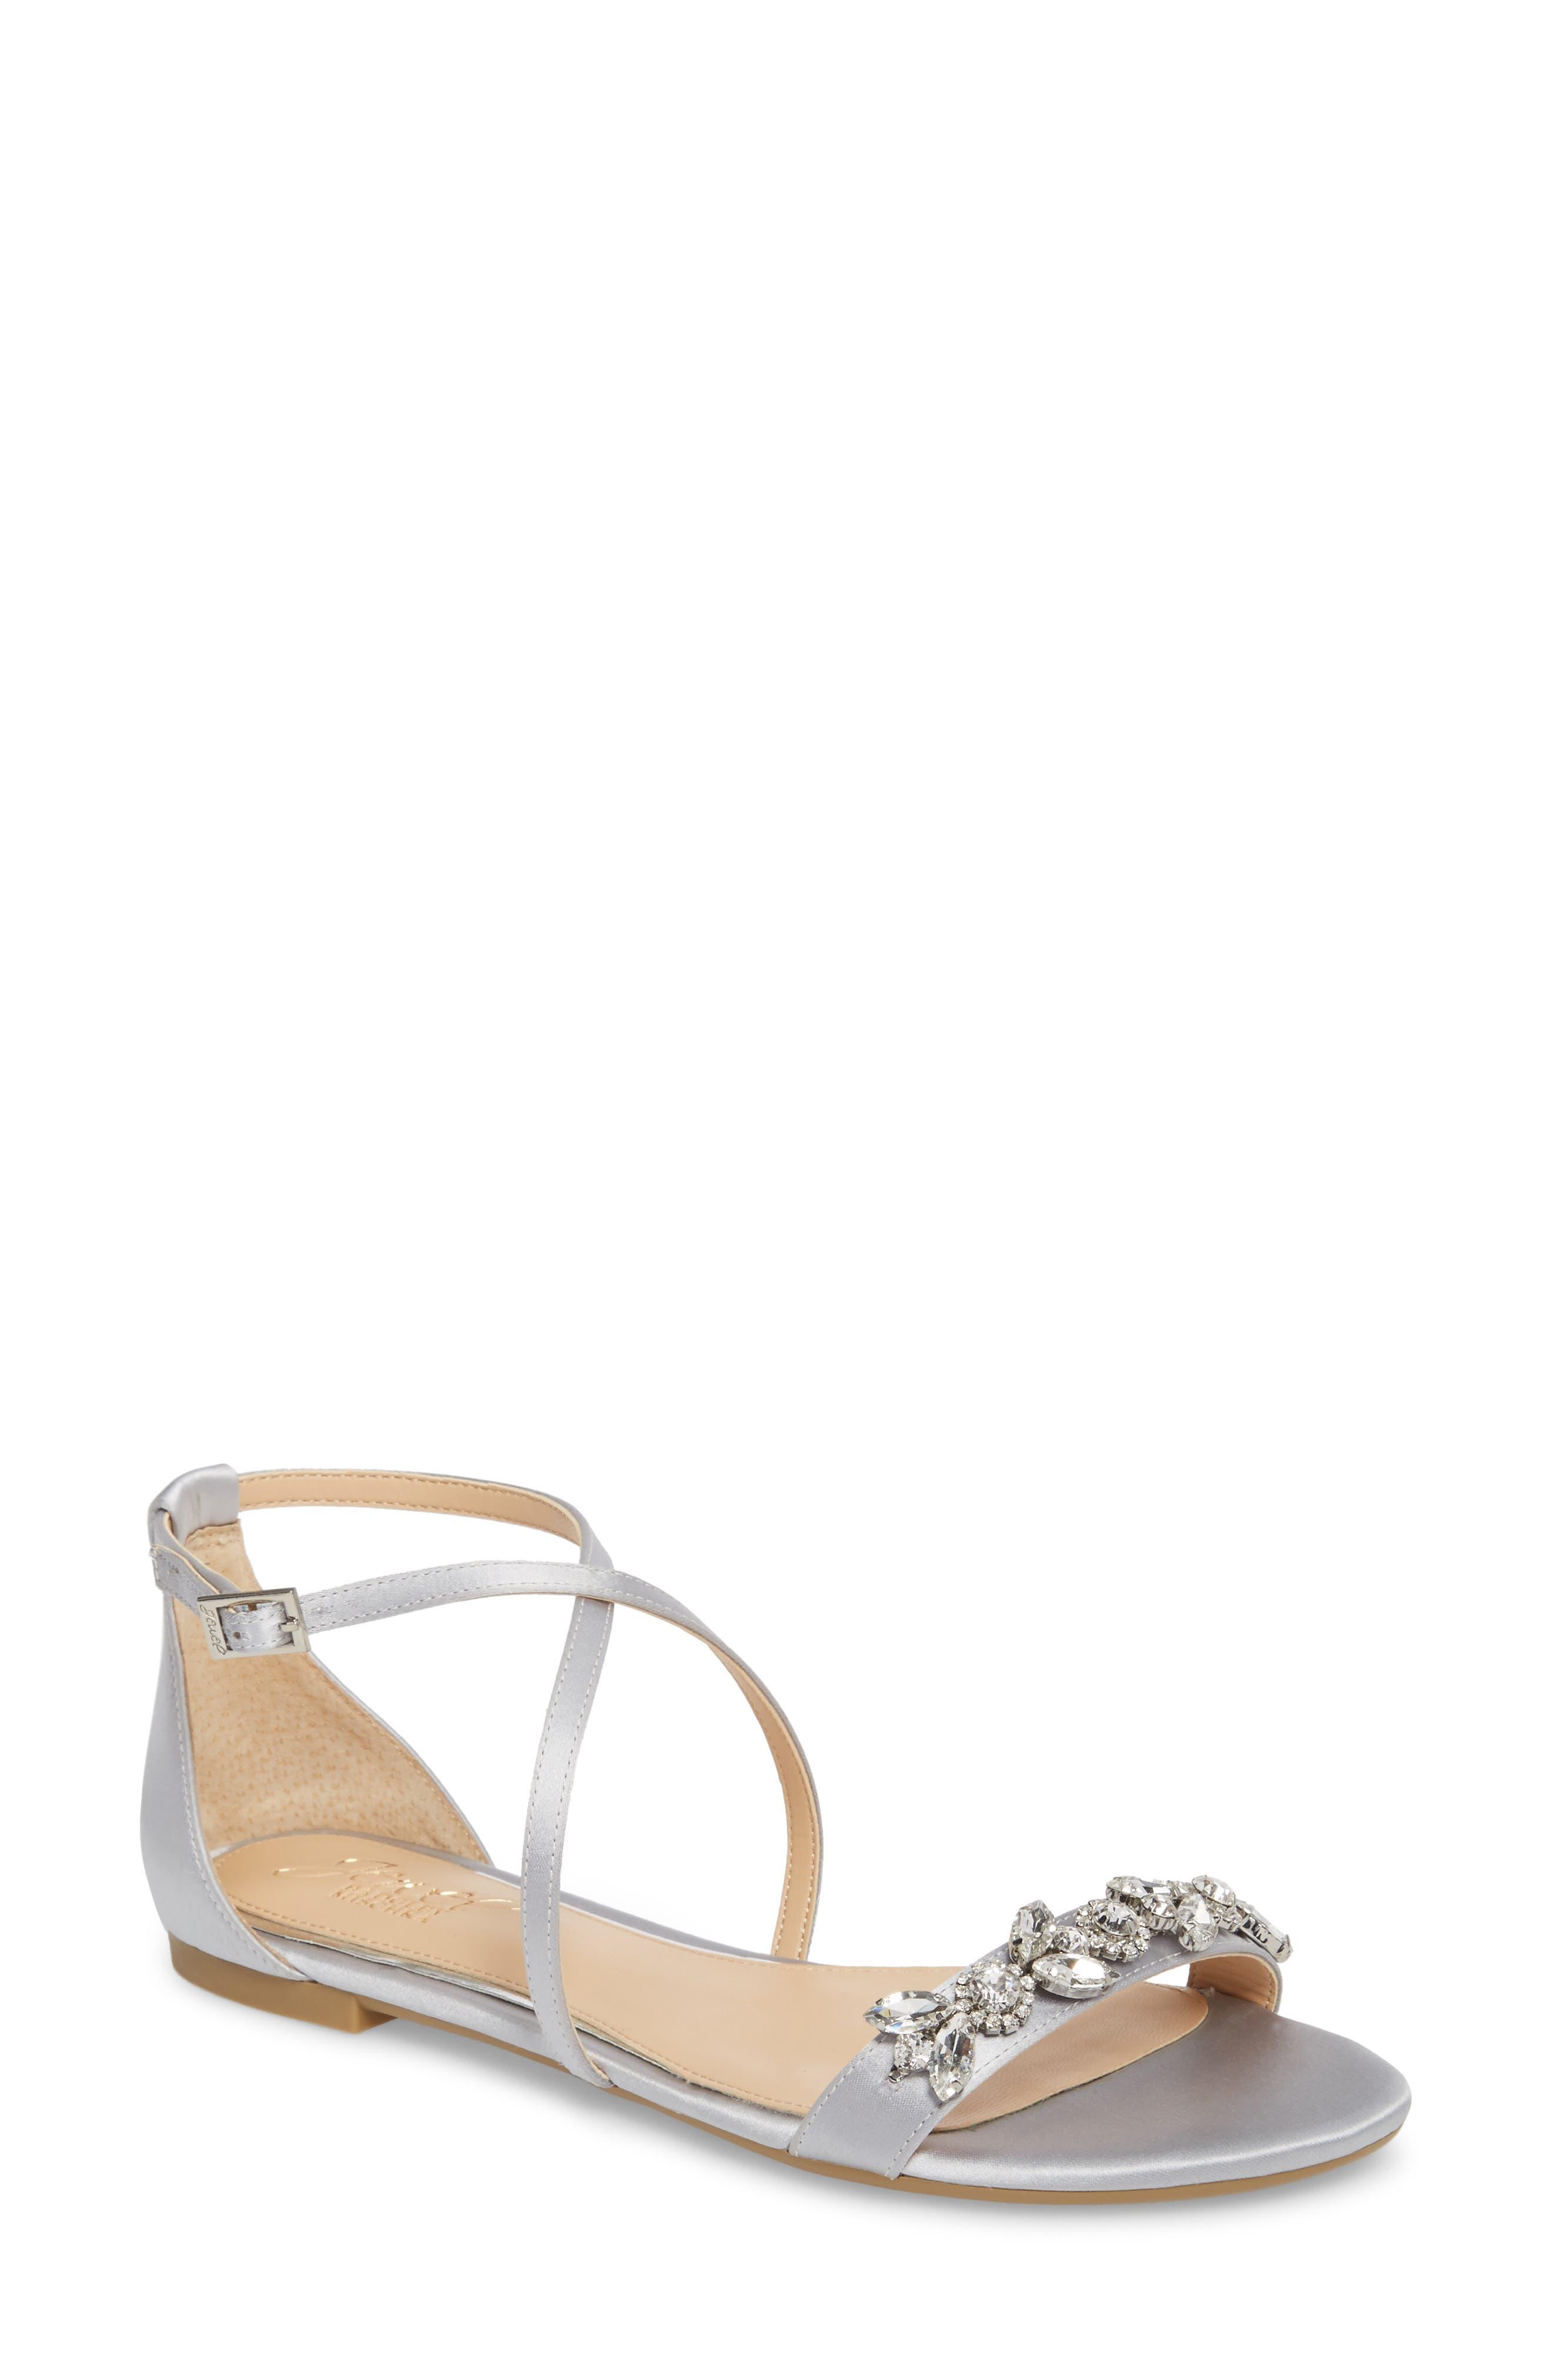 Main Image - Jewel Badgley Mischka Tessy Embellished Sandal (Women)